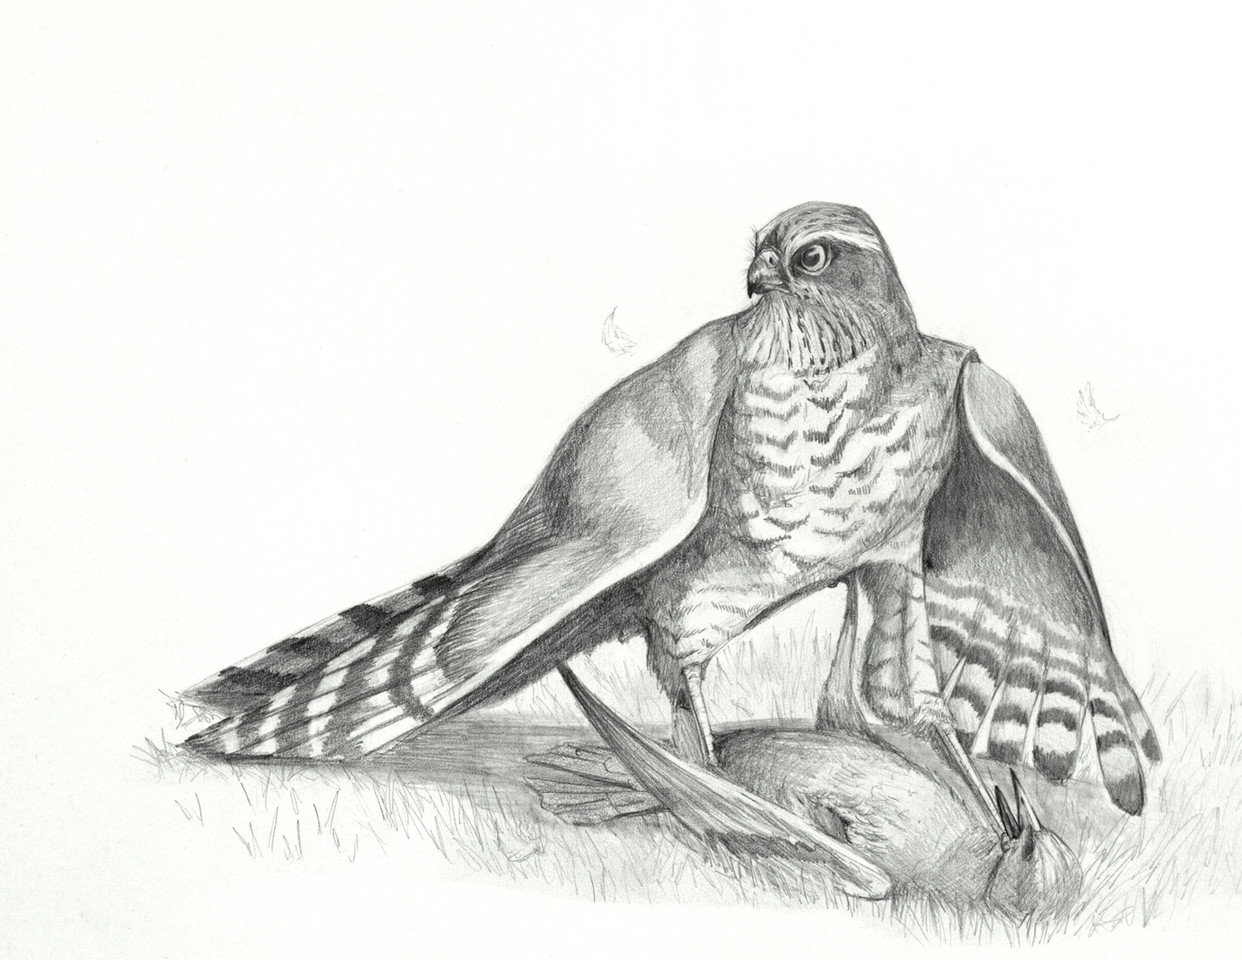 Eurasian Sparrowhawk's prey restraint